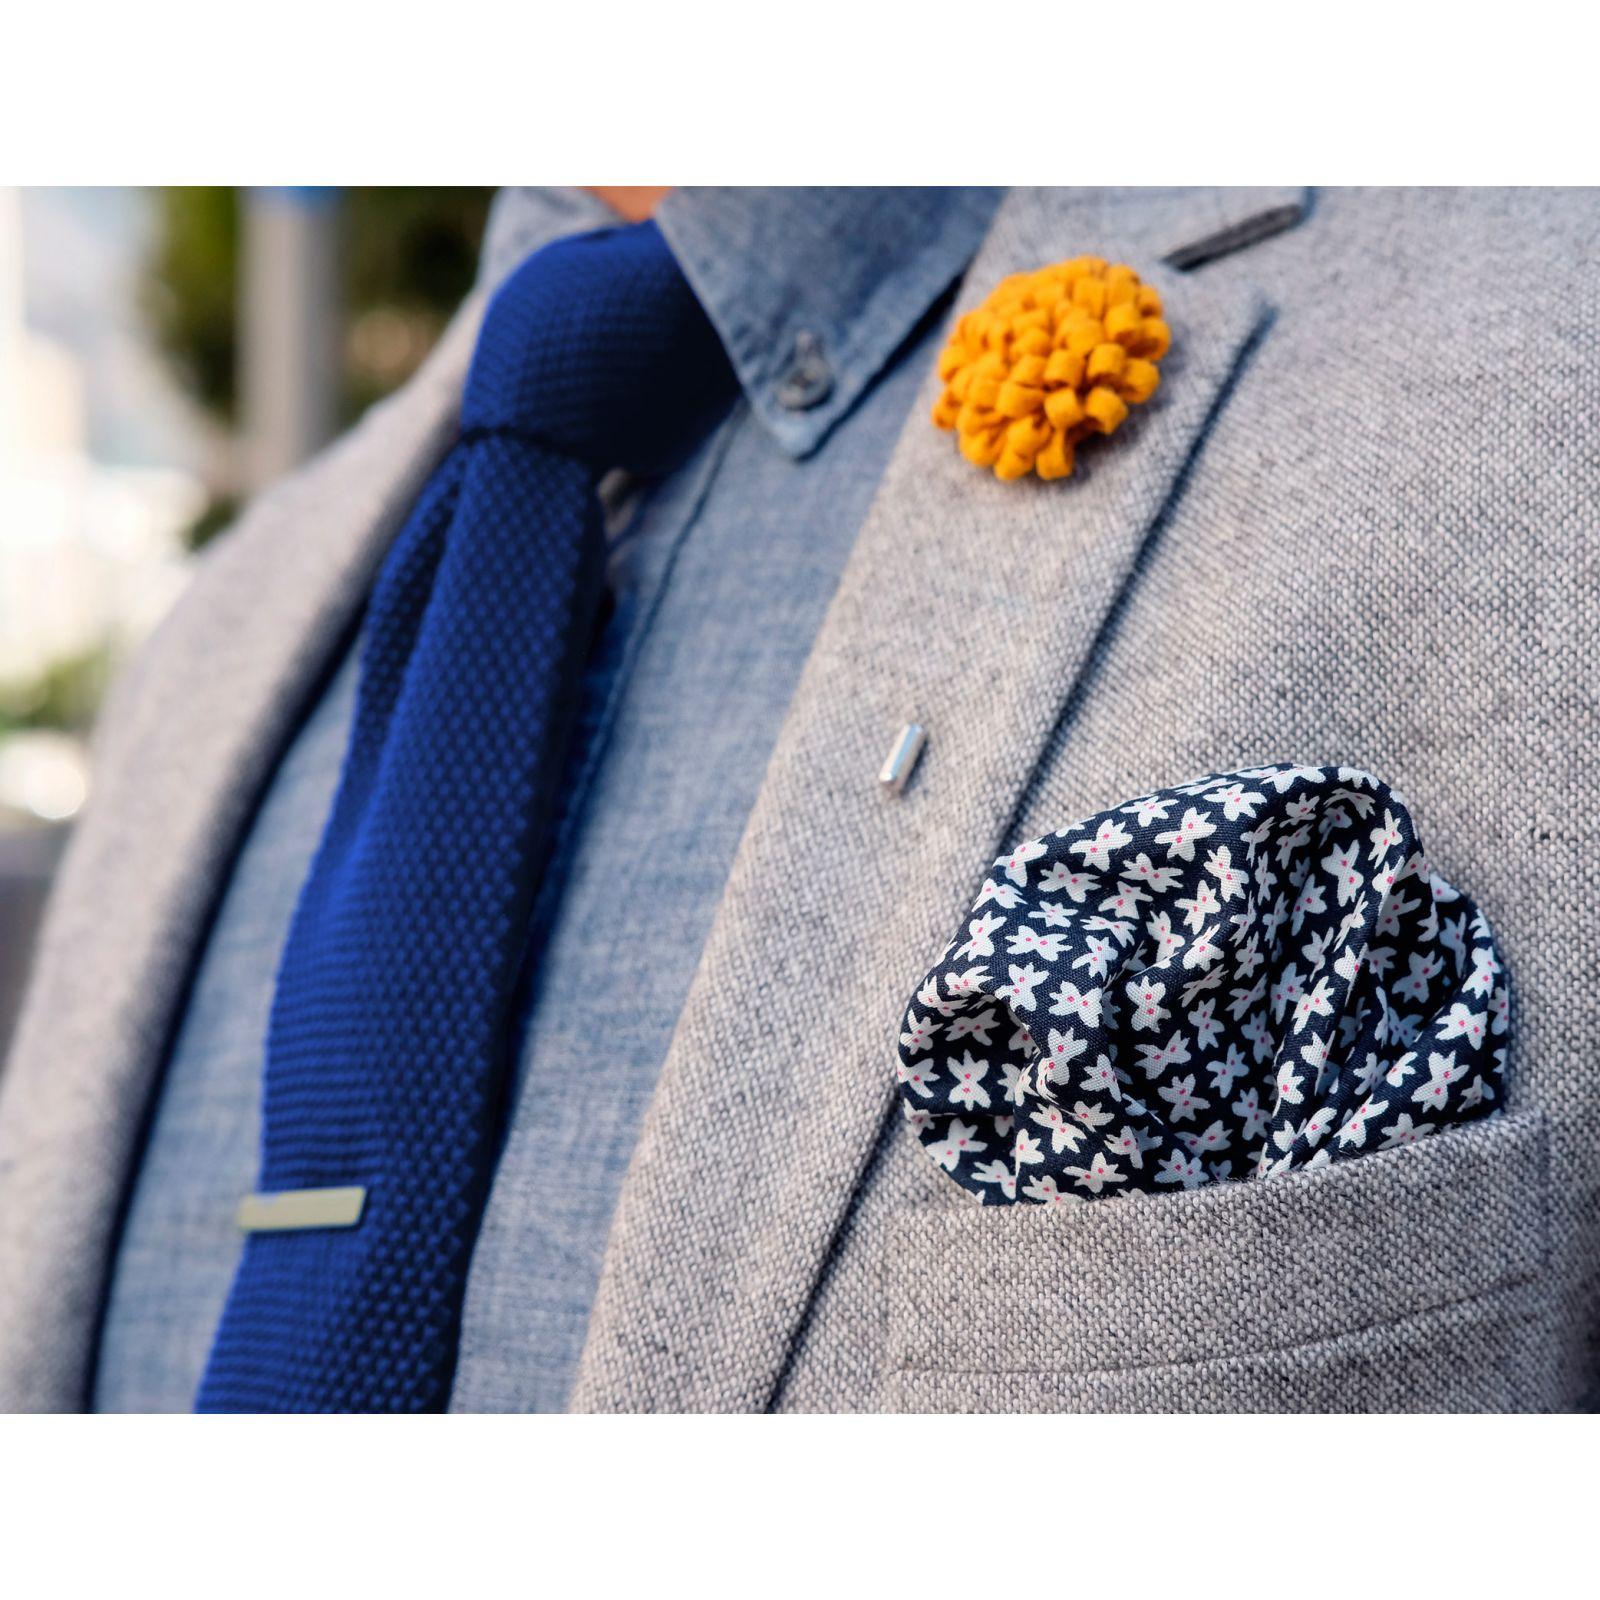 White & Blue Stripe Knitted Tie Trendhim uZHV6u10